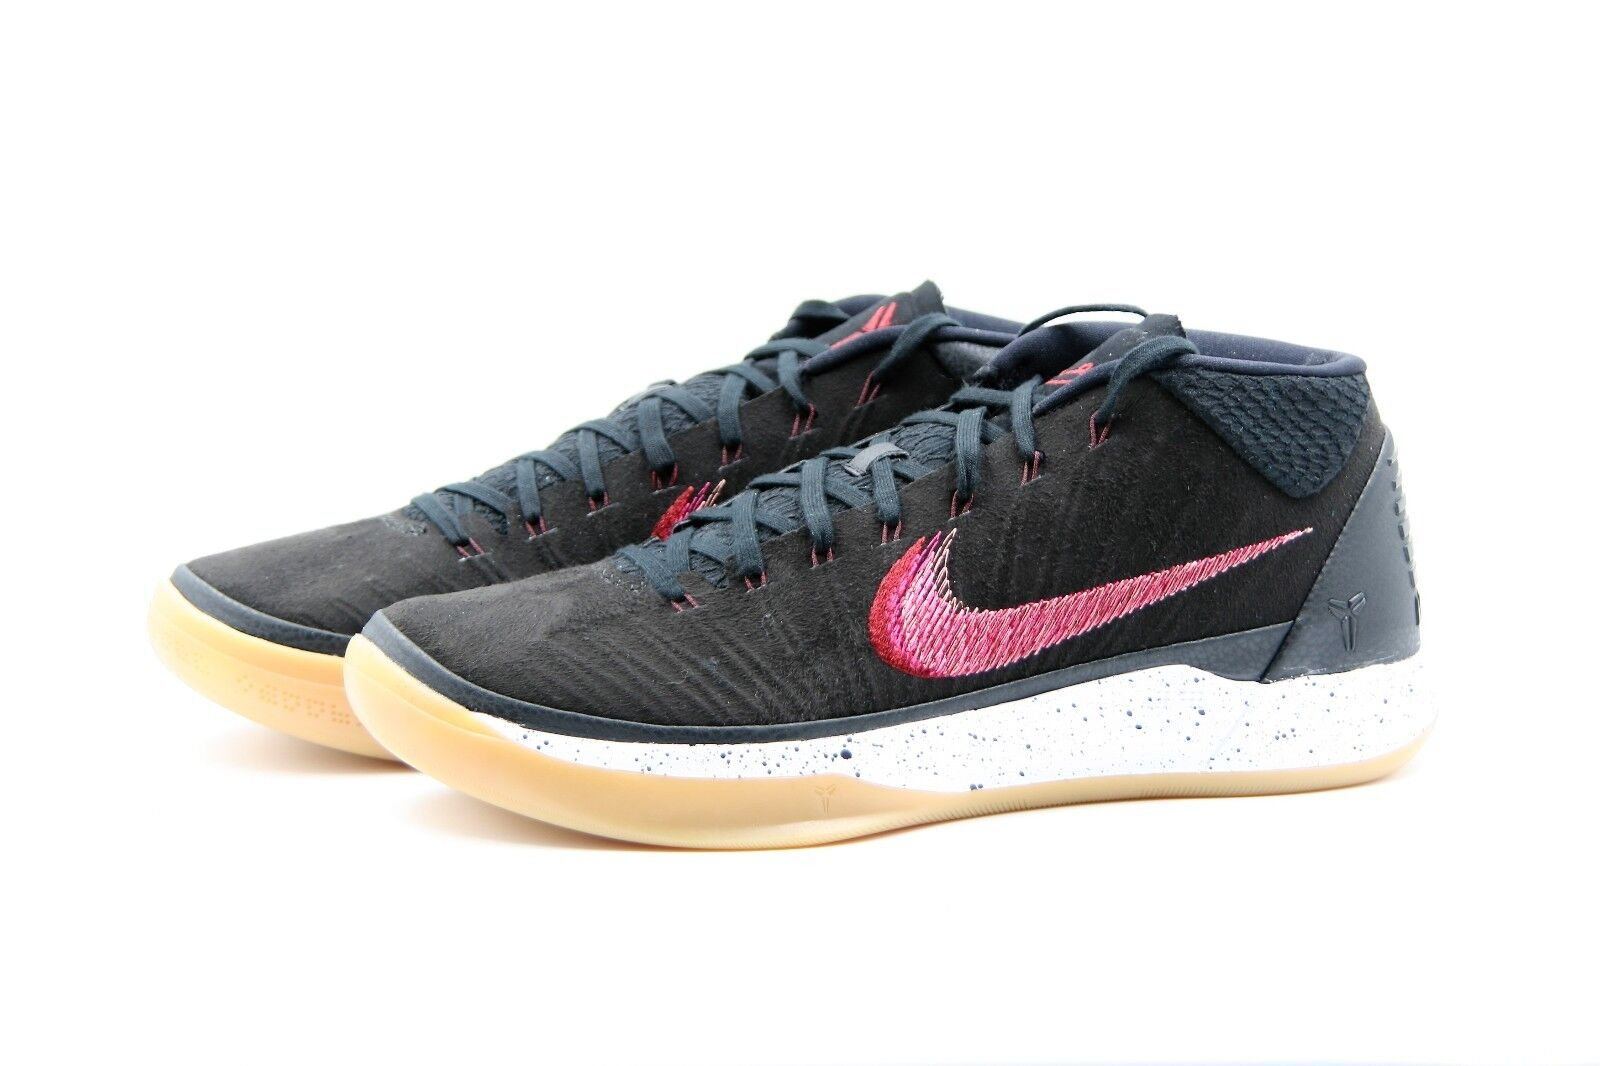 f6f583424ab8e Men s Nike Kobe AD Size 9.5 (922482 (922482 (922482 006) Black Sail Gum  4a6b70